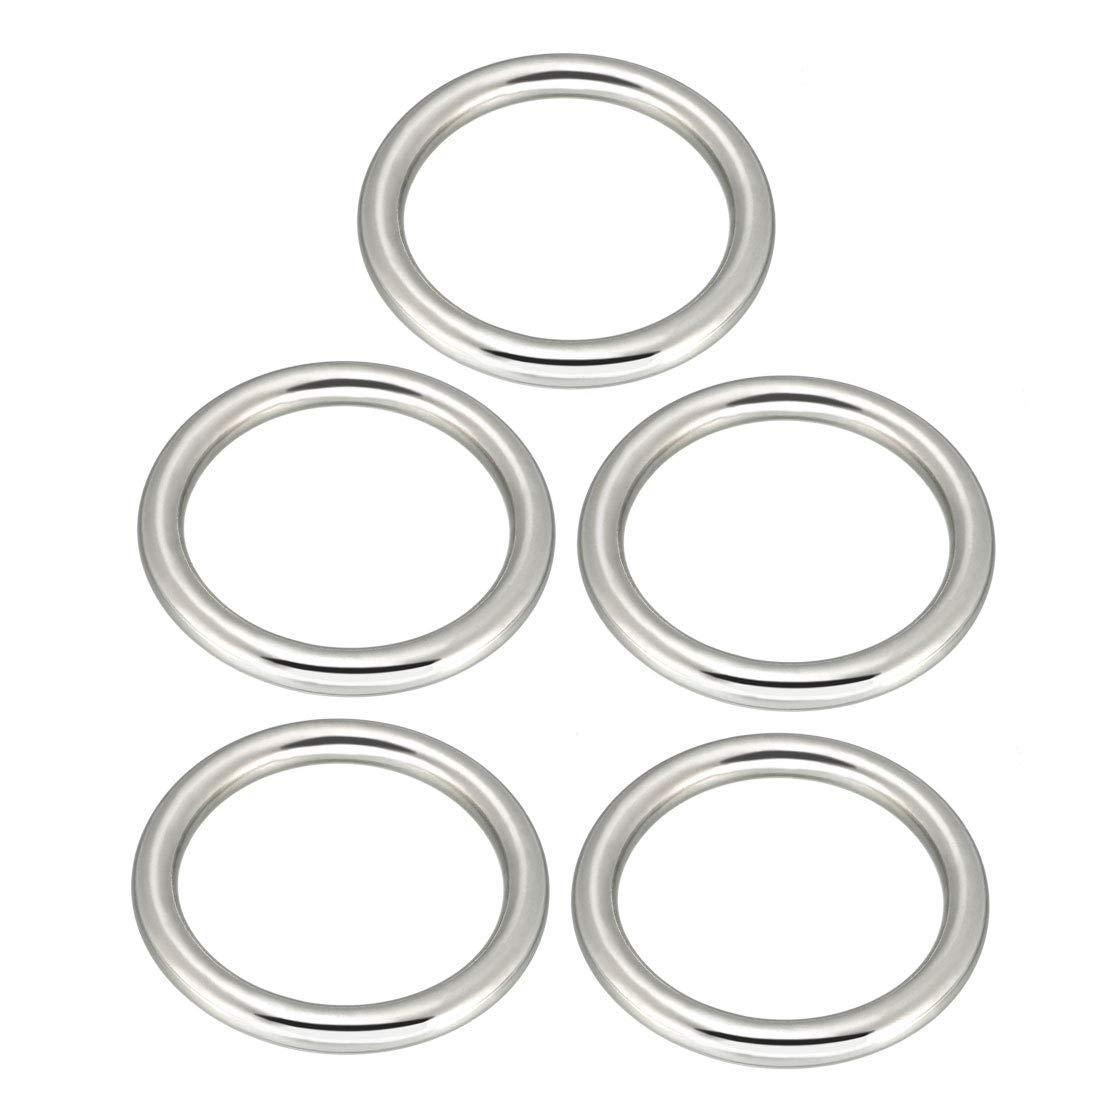 sourcing map 5 St/ück Metall O Ring 60mm x 50mm x 5mm f/ür Hardware Taschen Ring DIY Zubeh/ör de